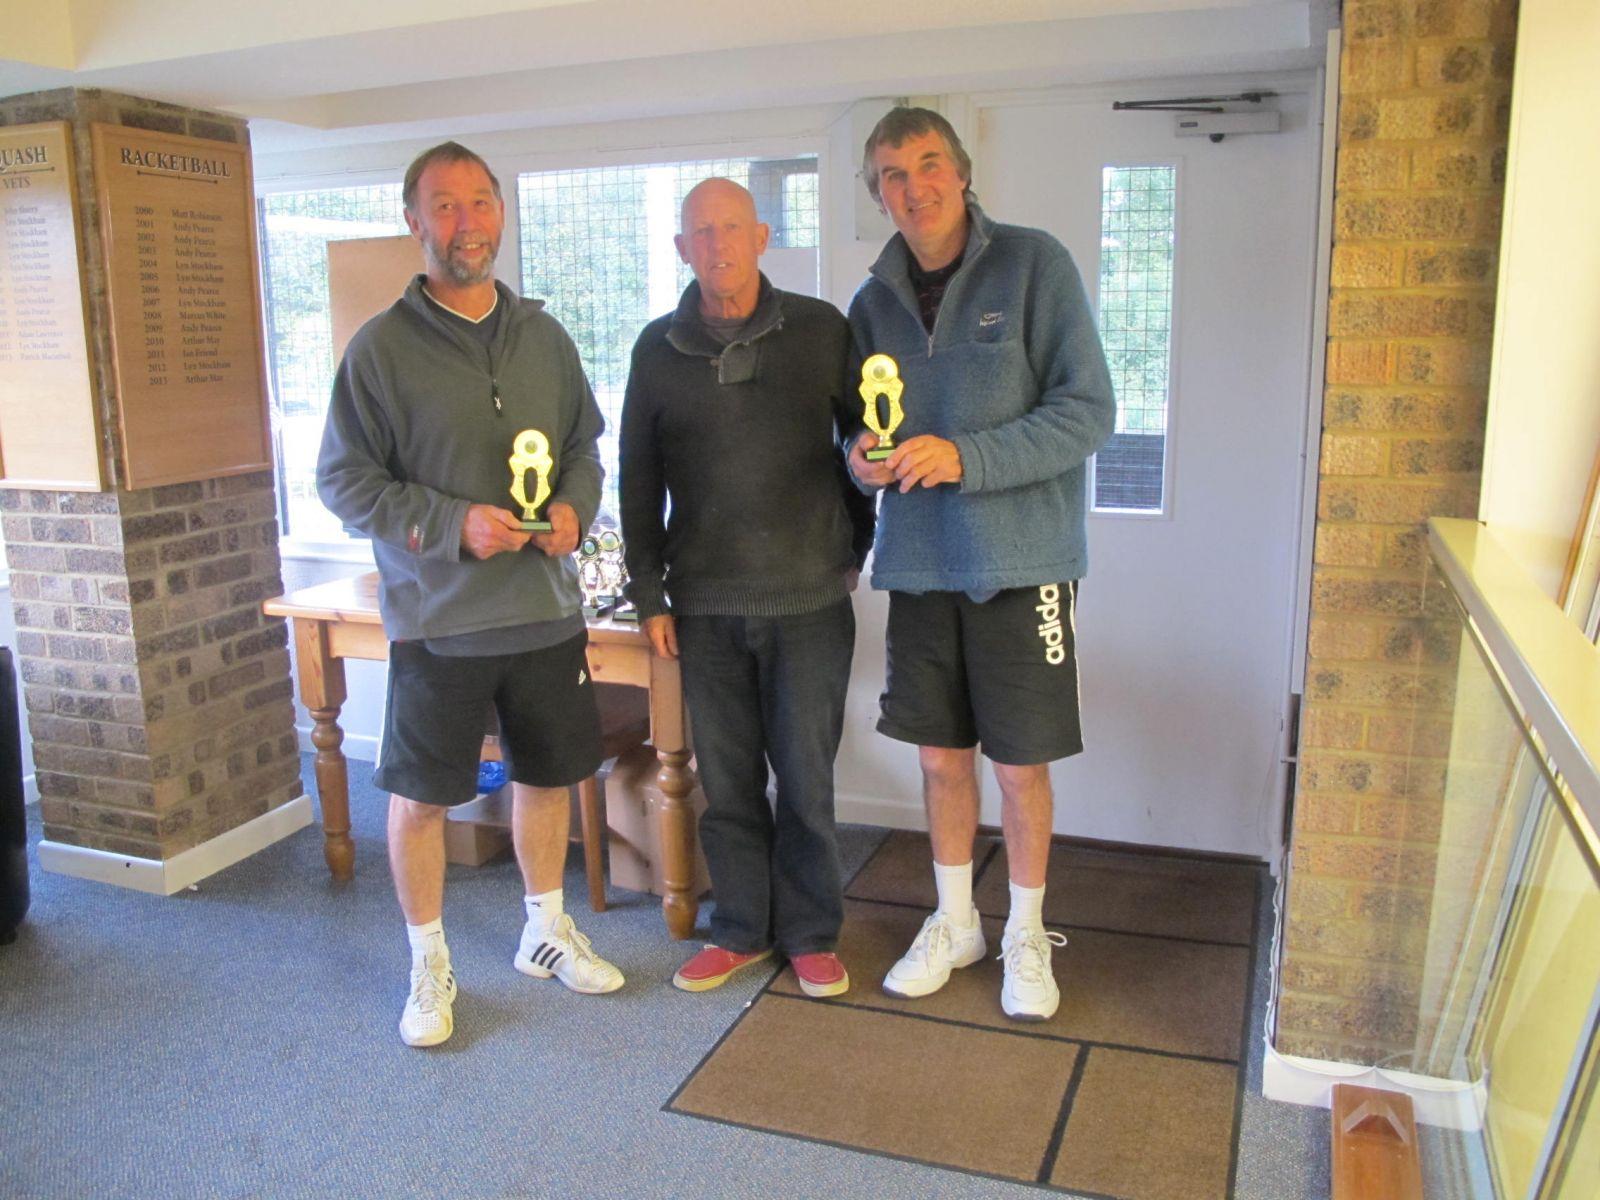 Tim Toogood & John Hobbs, Men's Doubles runners-up